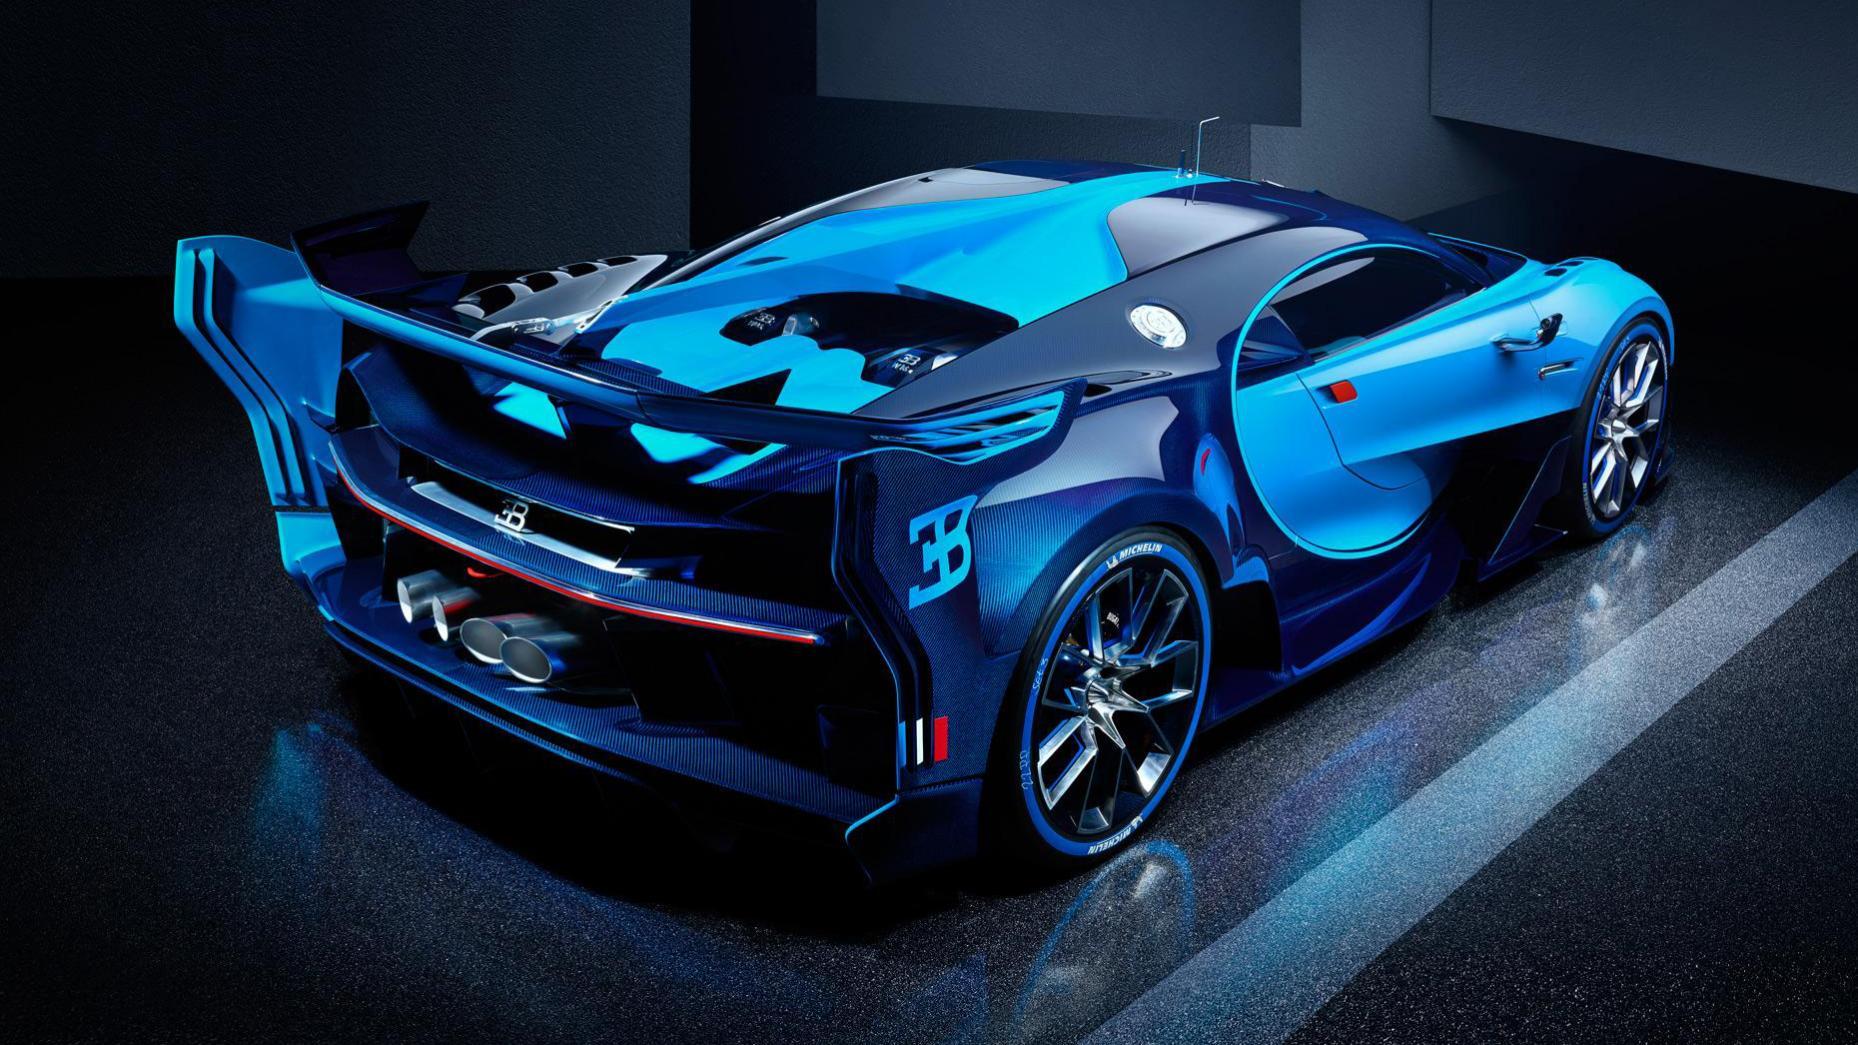 New Bugatti Chiron Wallpaper Carros De Lujos De 2017